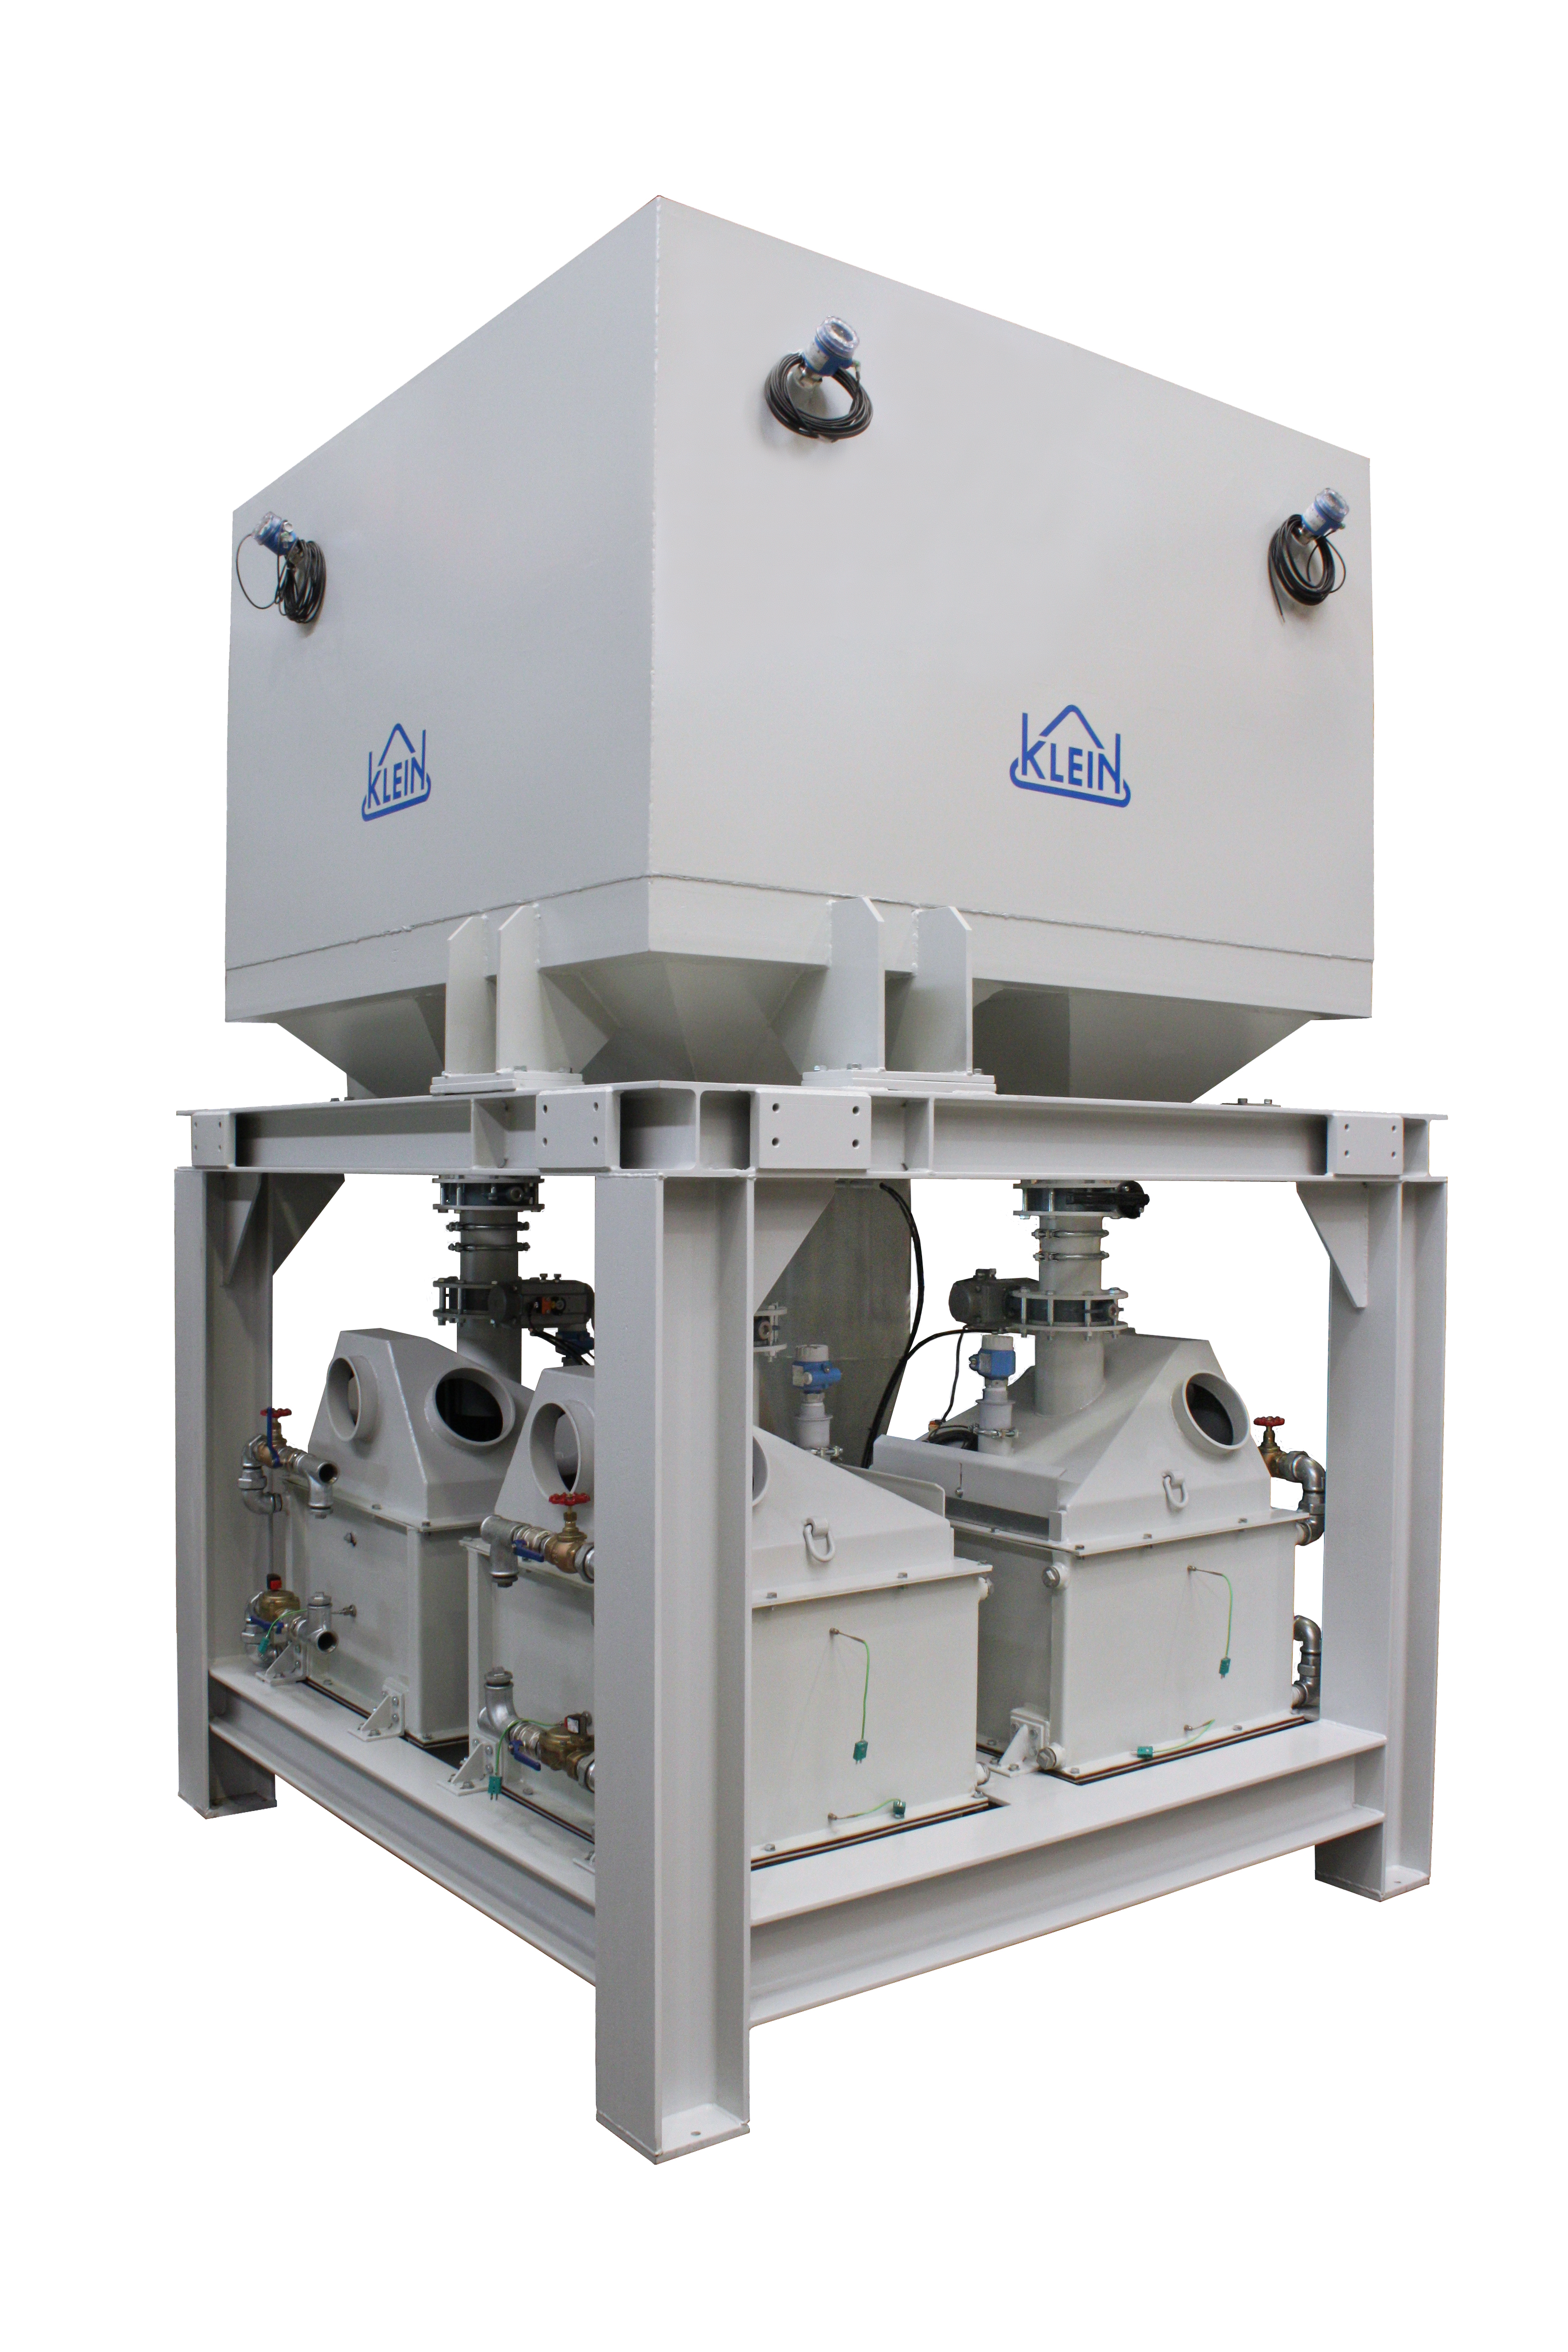 Bild 4: Sandkühler (KLEIN Anlagenbau AG)